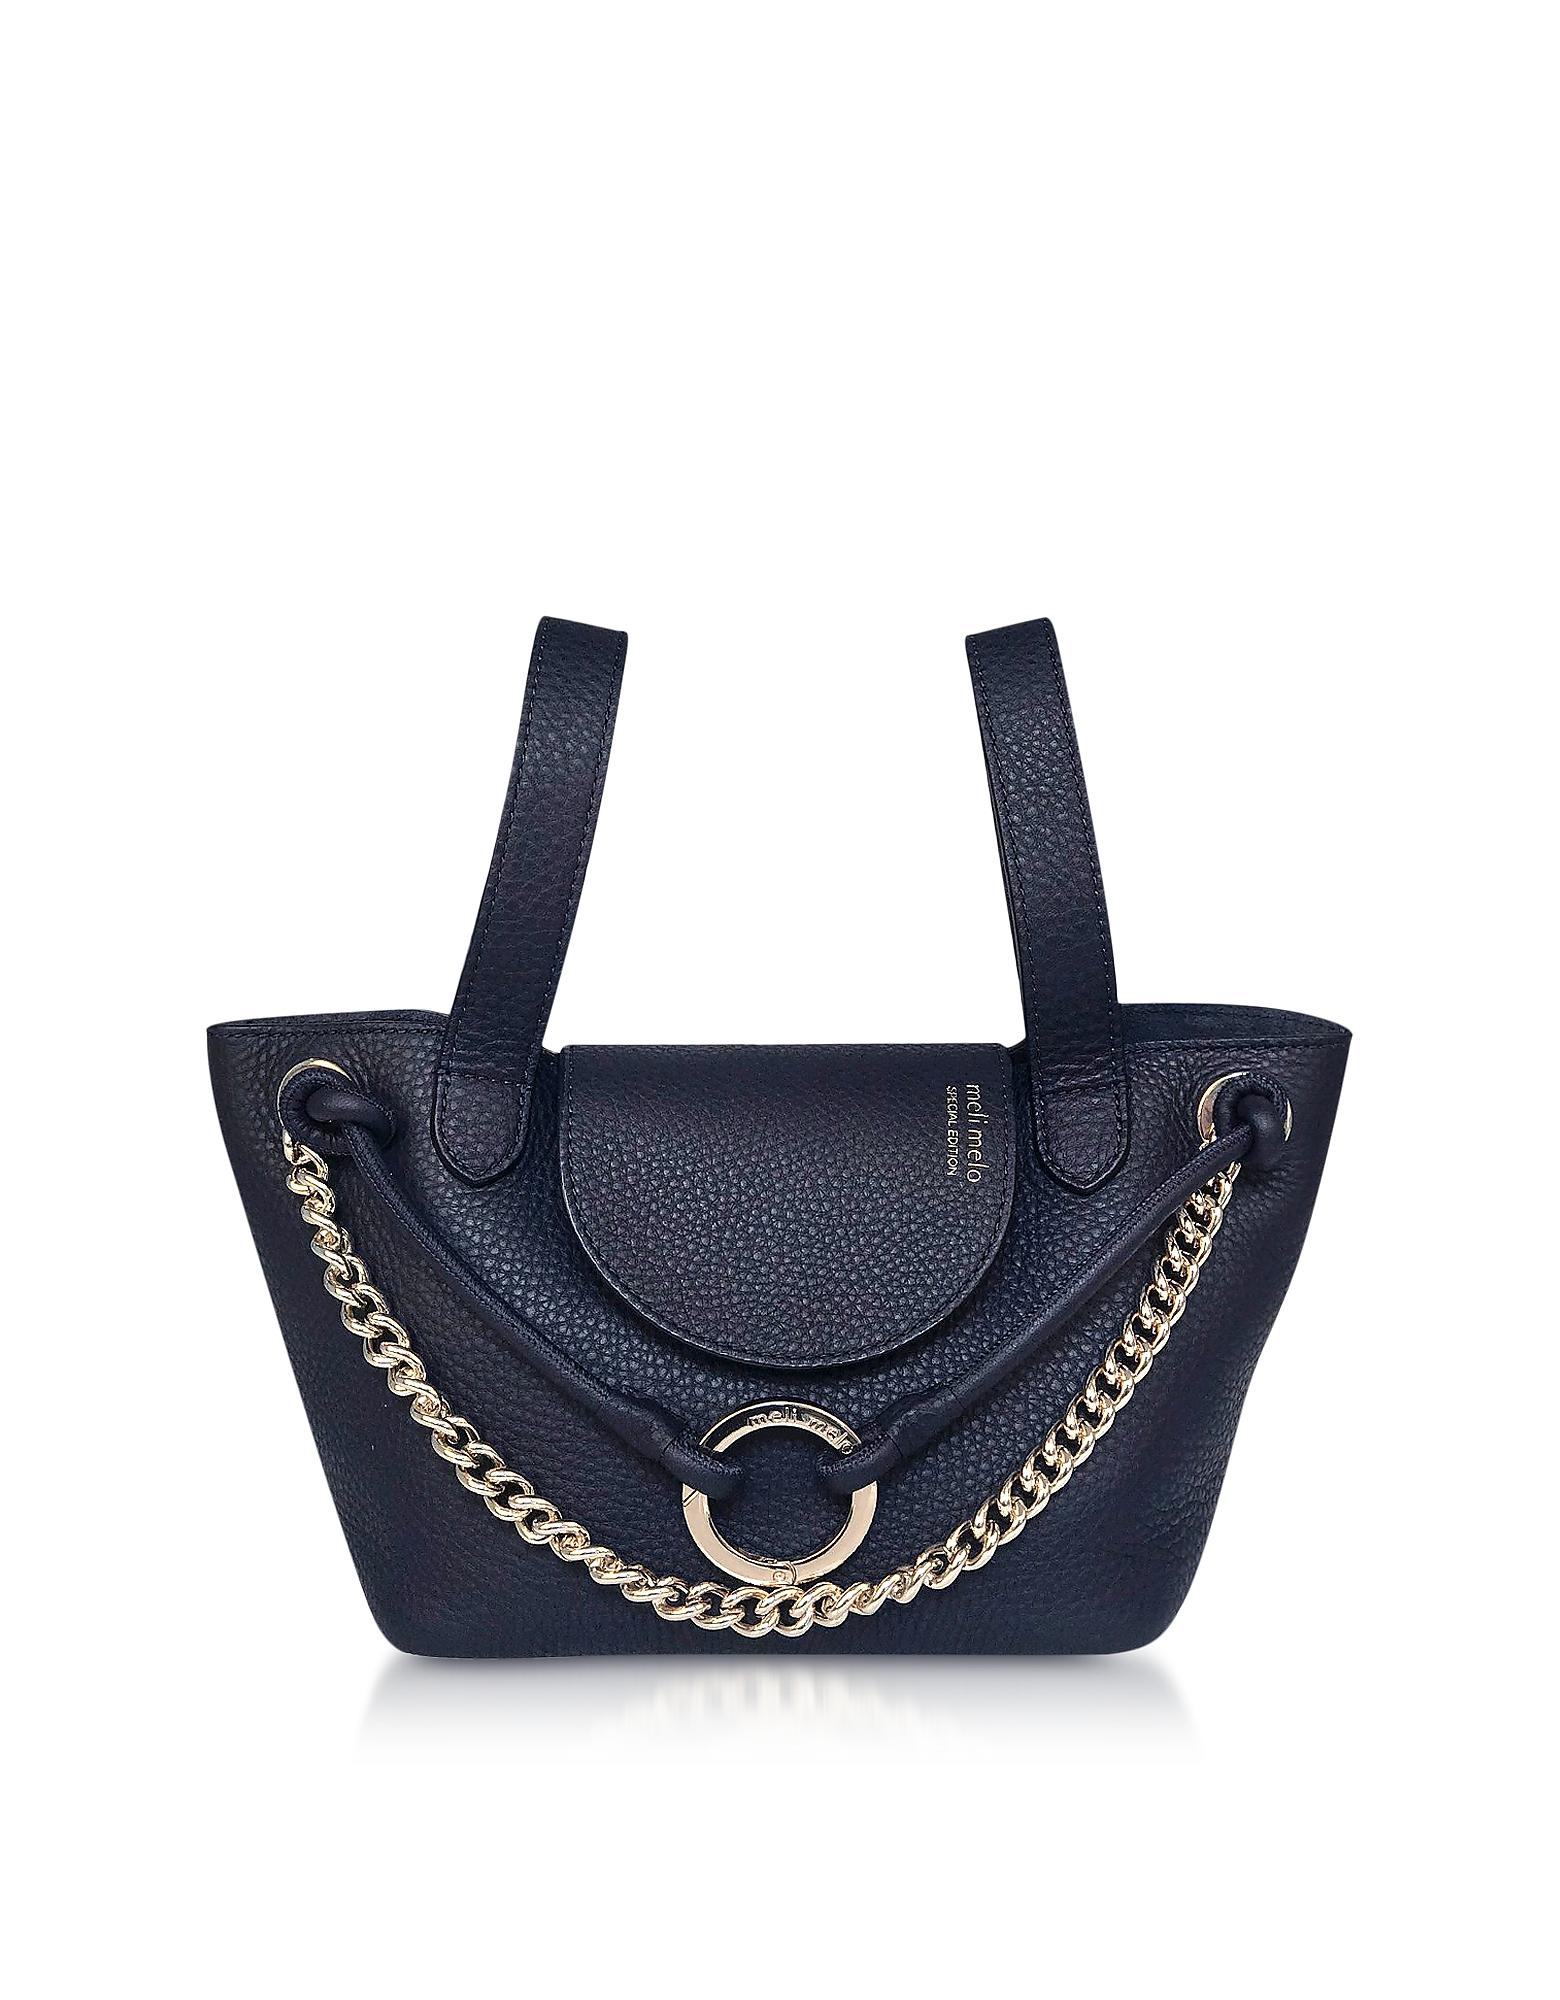 Image of Meli Melo Designer Handbags, Linked Thela Mini Tote Bag